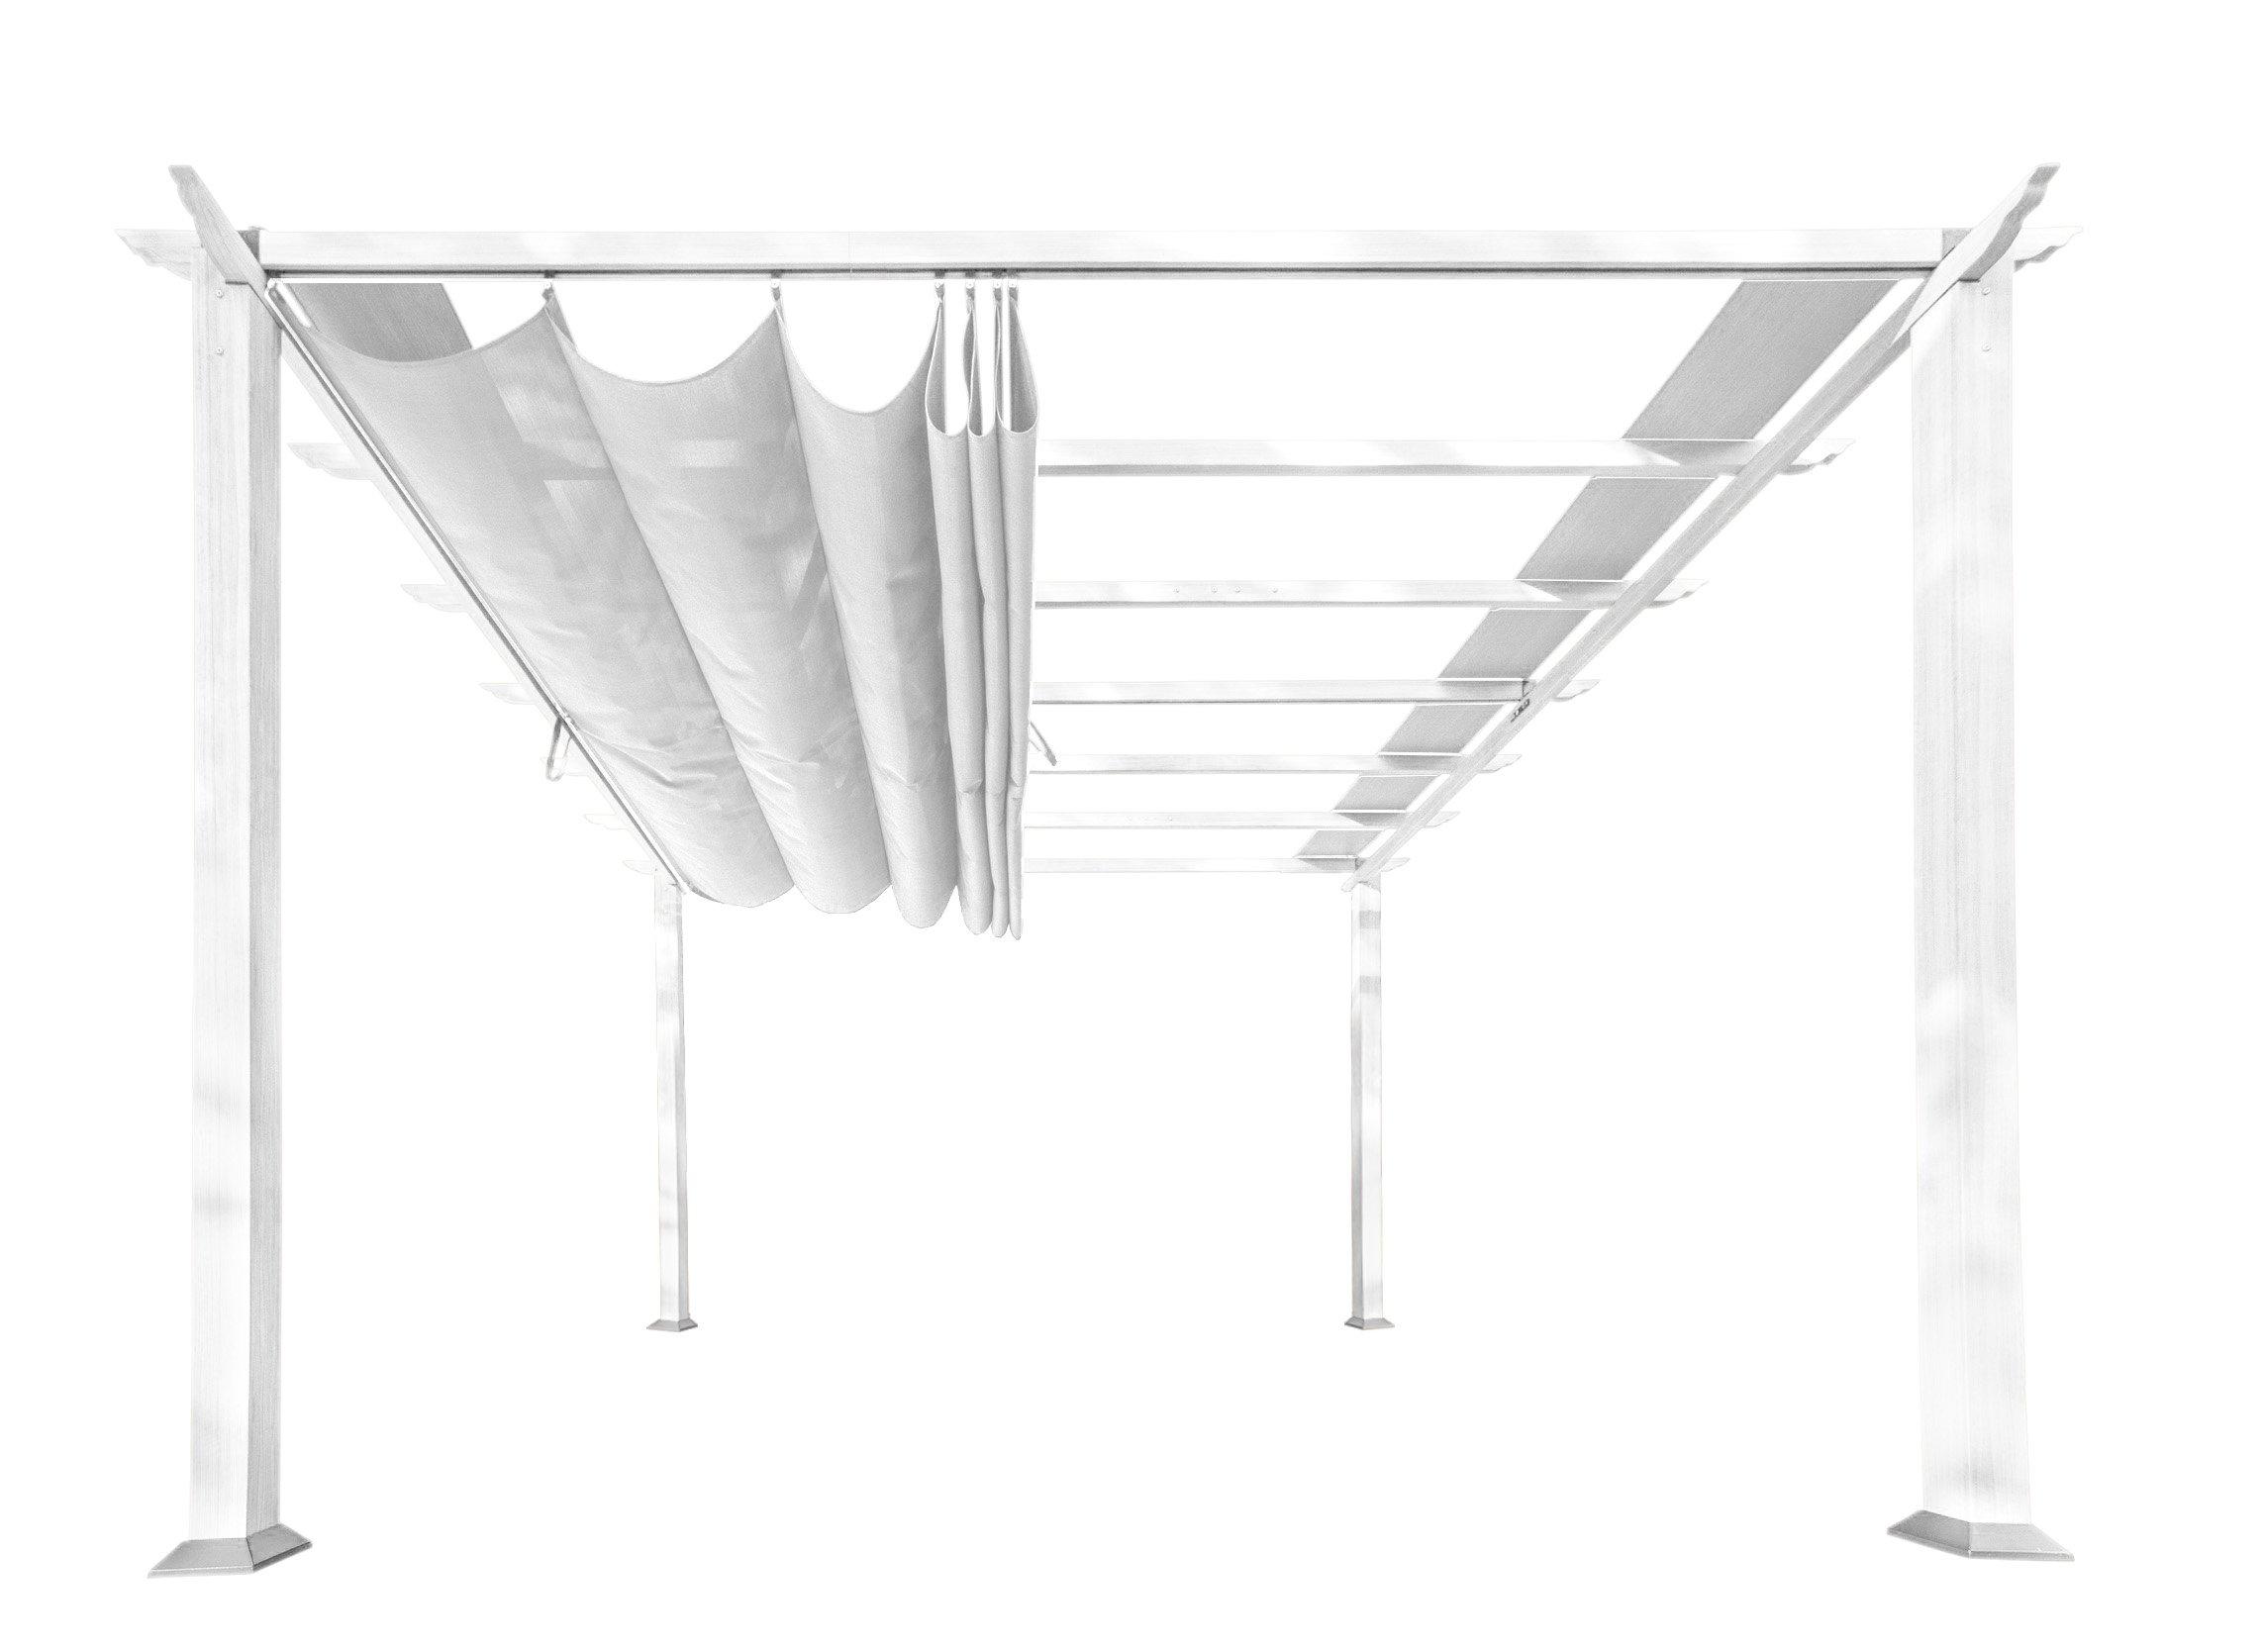 Paragon Outdoor PR11WTW Backyard Structure Soft Top with White Frame Aspen Pergola, 11' x 11', Off